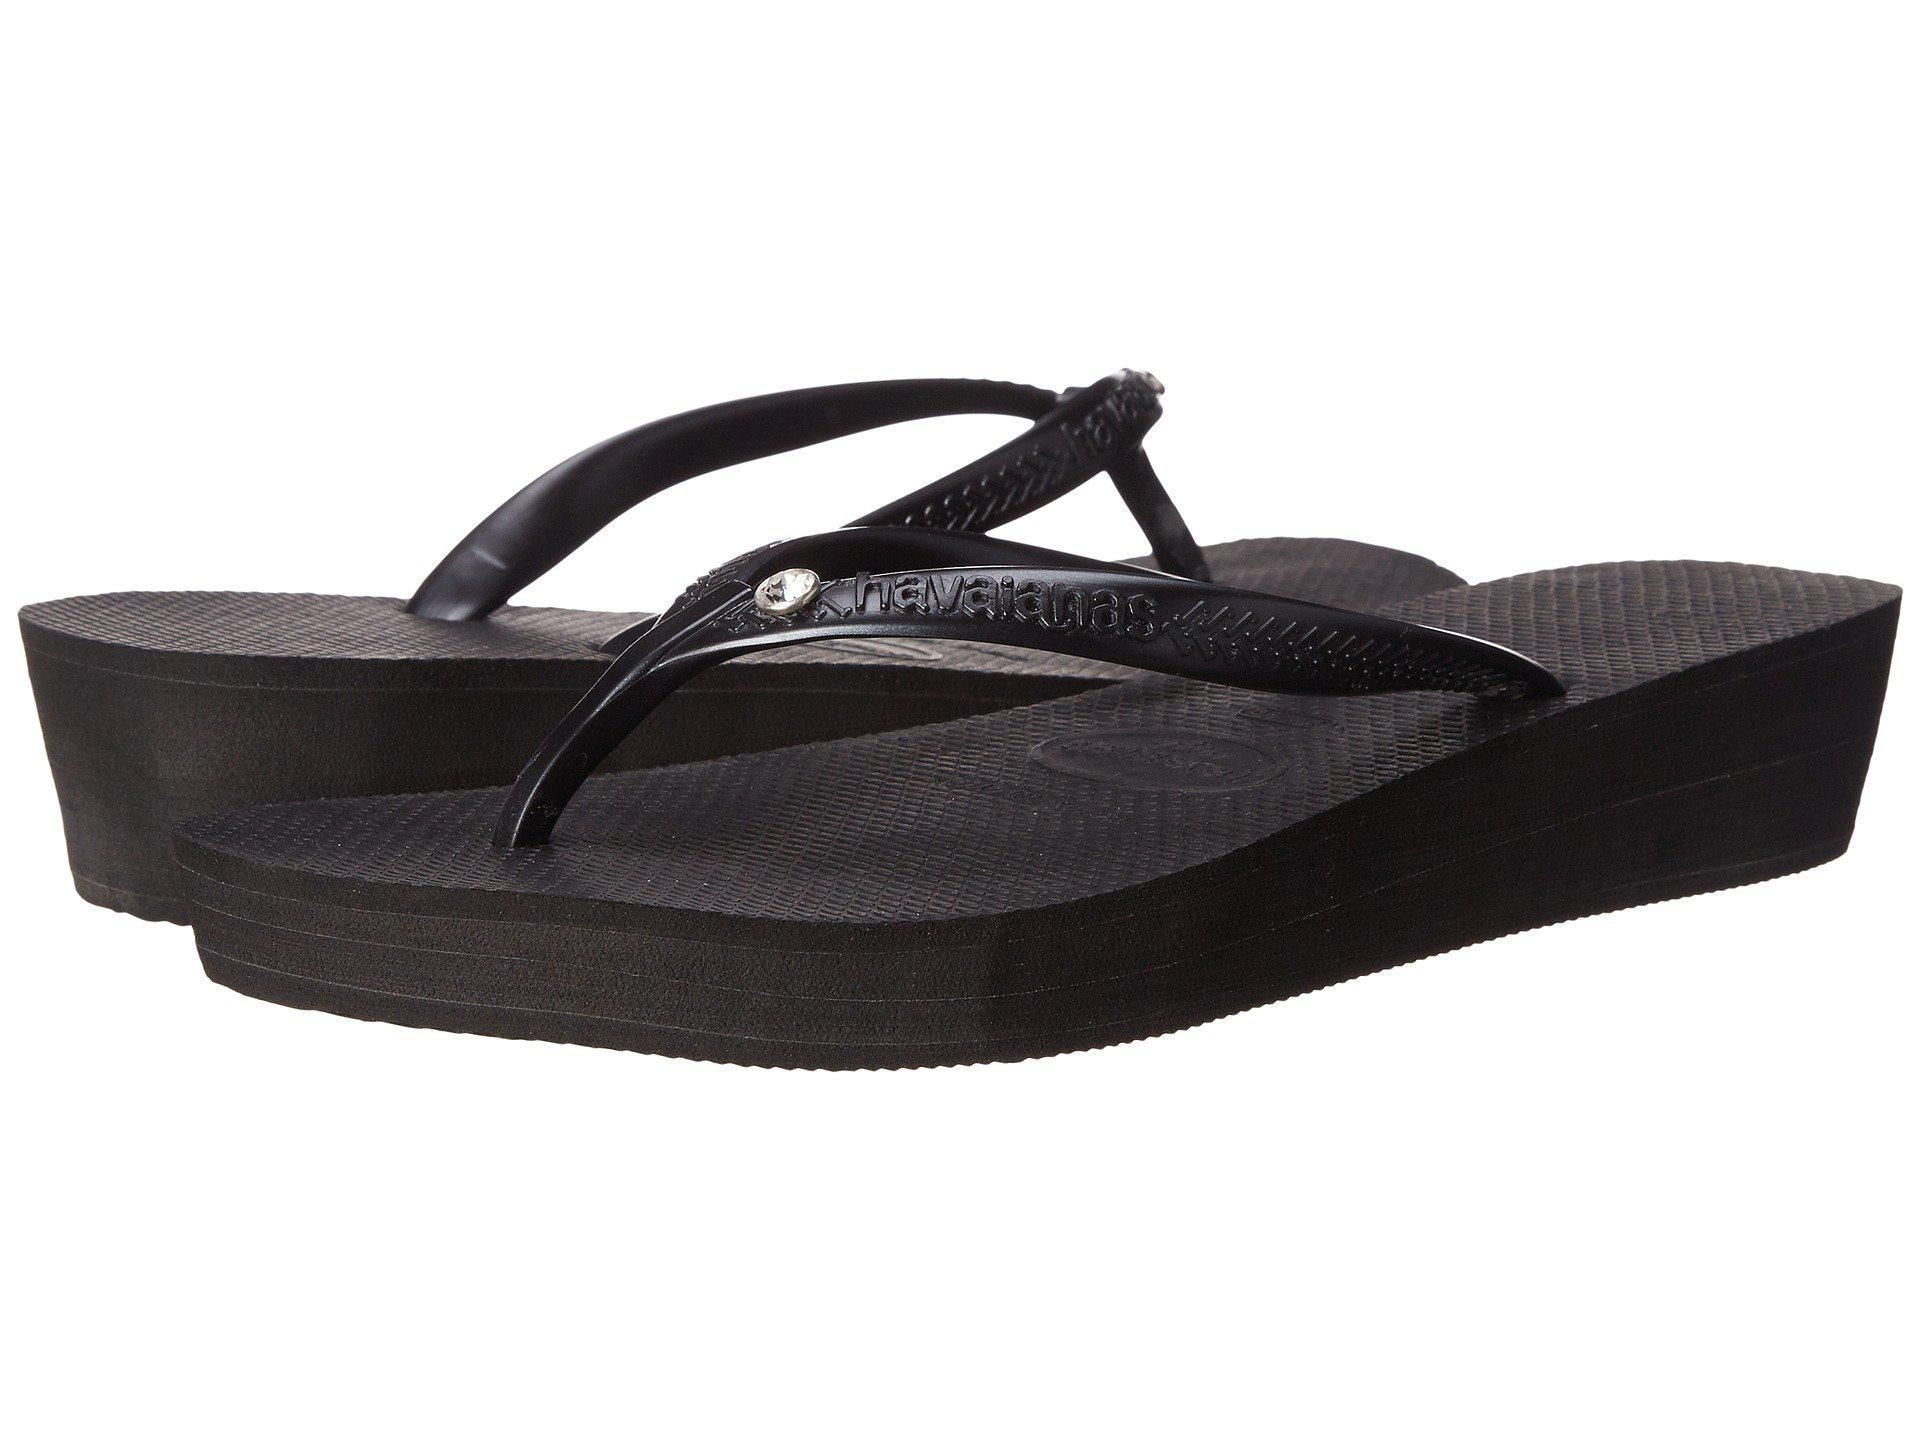 5f3bbbf8b Lyst - Havaianas Highlight Glamour Flip Flops in Black